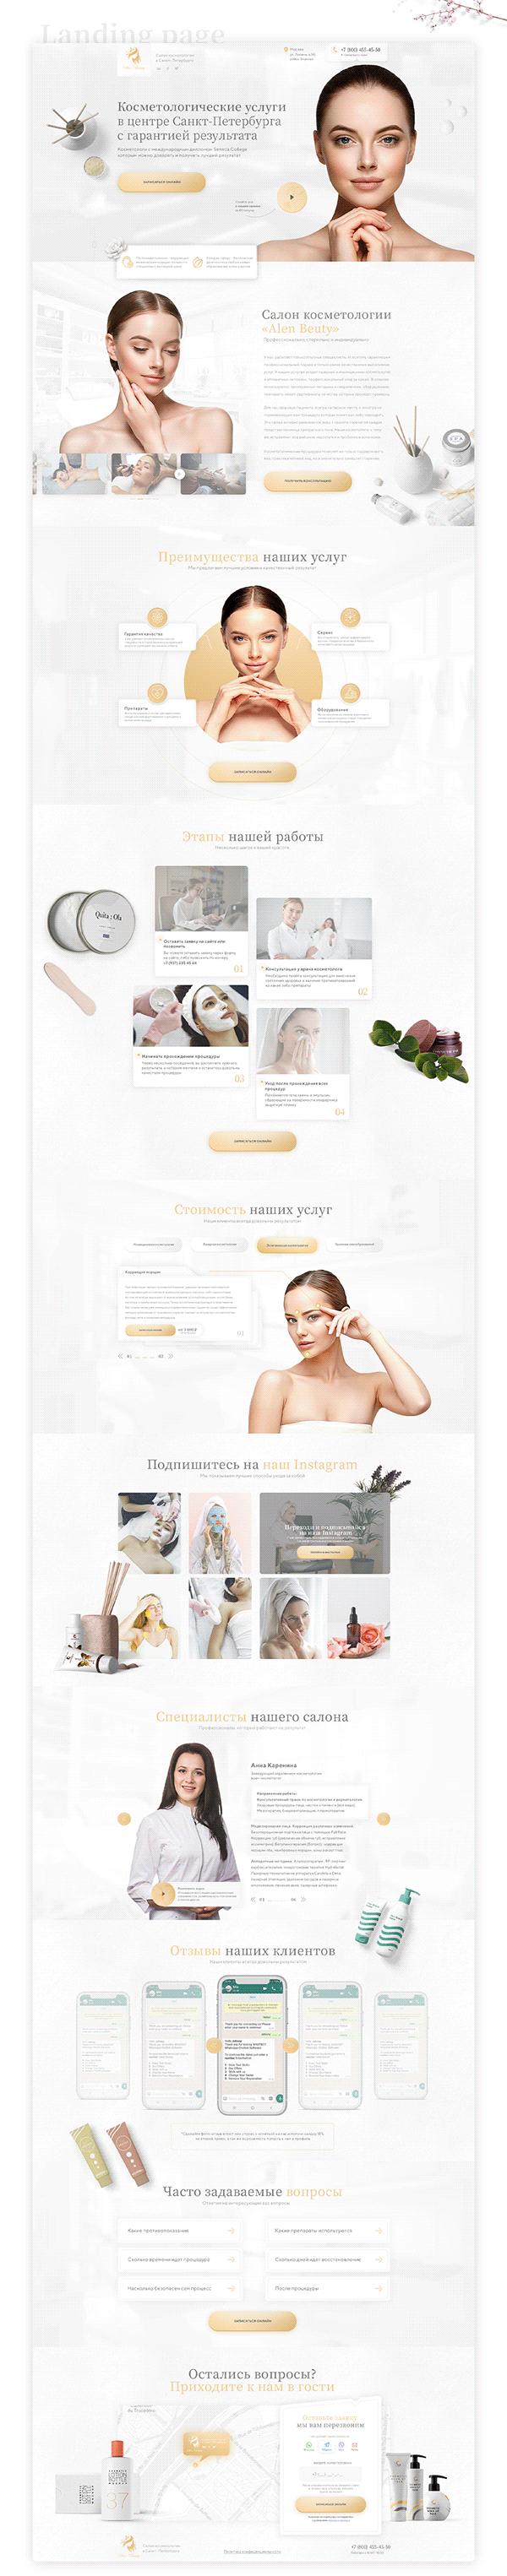 Cosmetology Landing Page